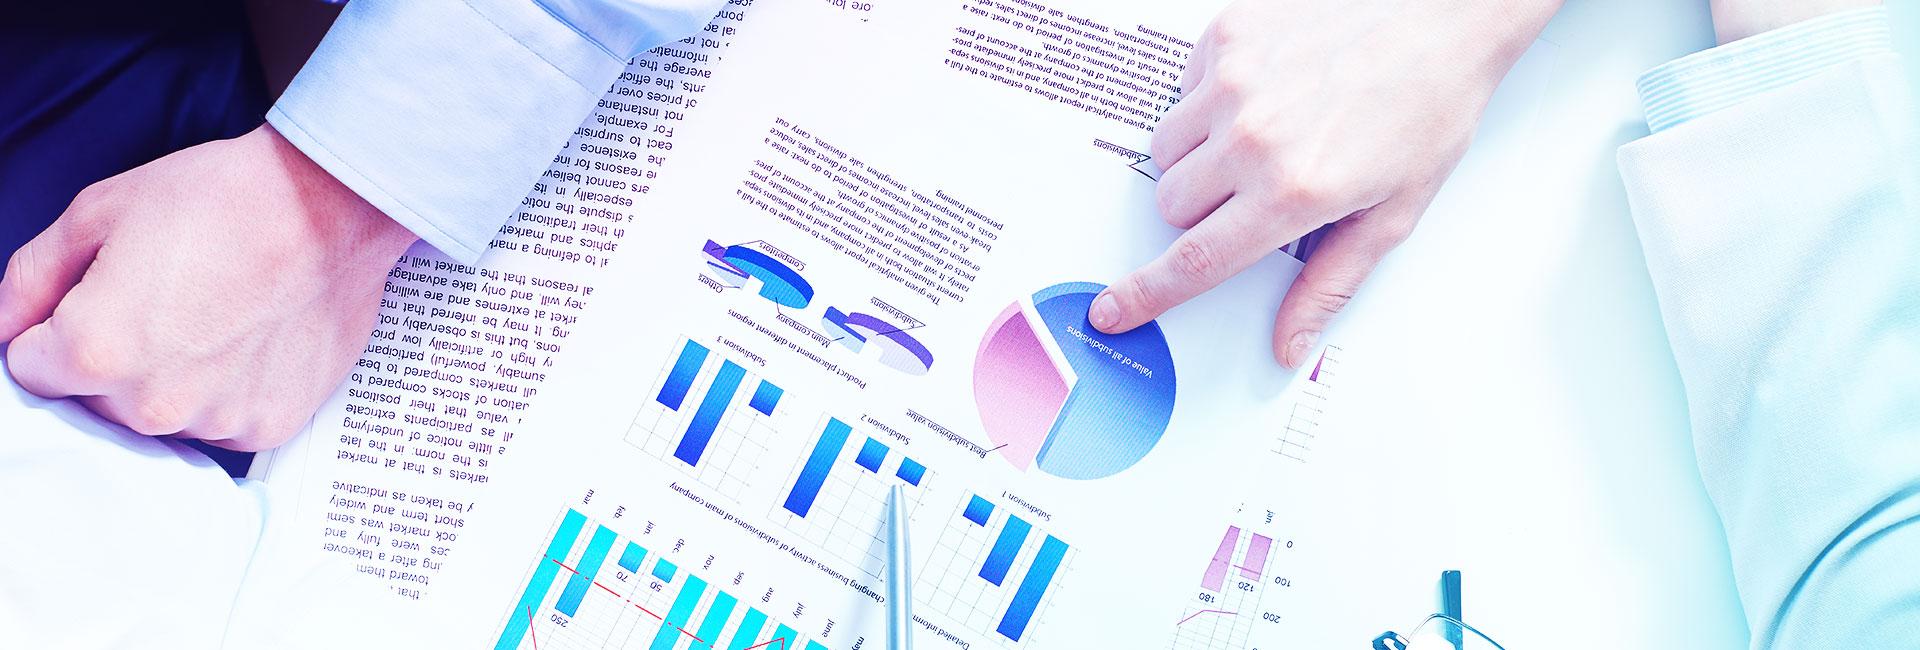 business-tax-accounting-srtk-9